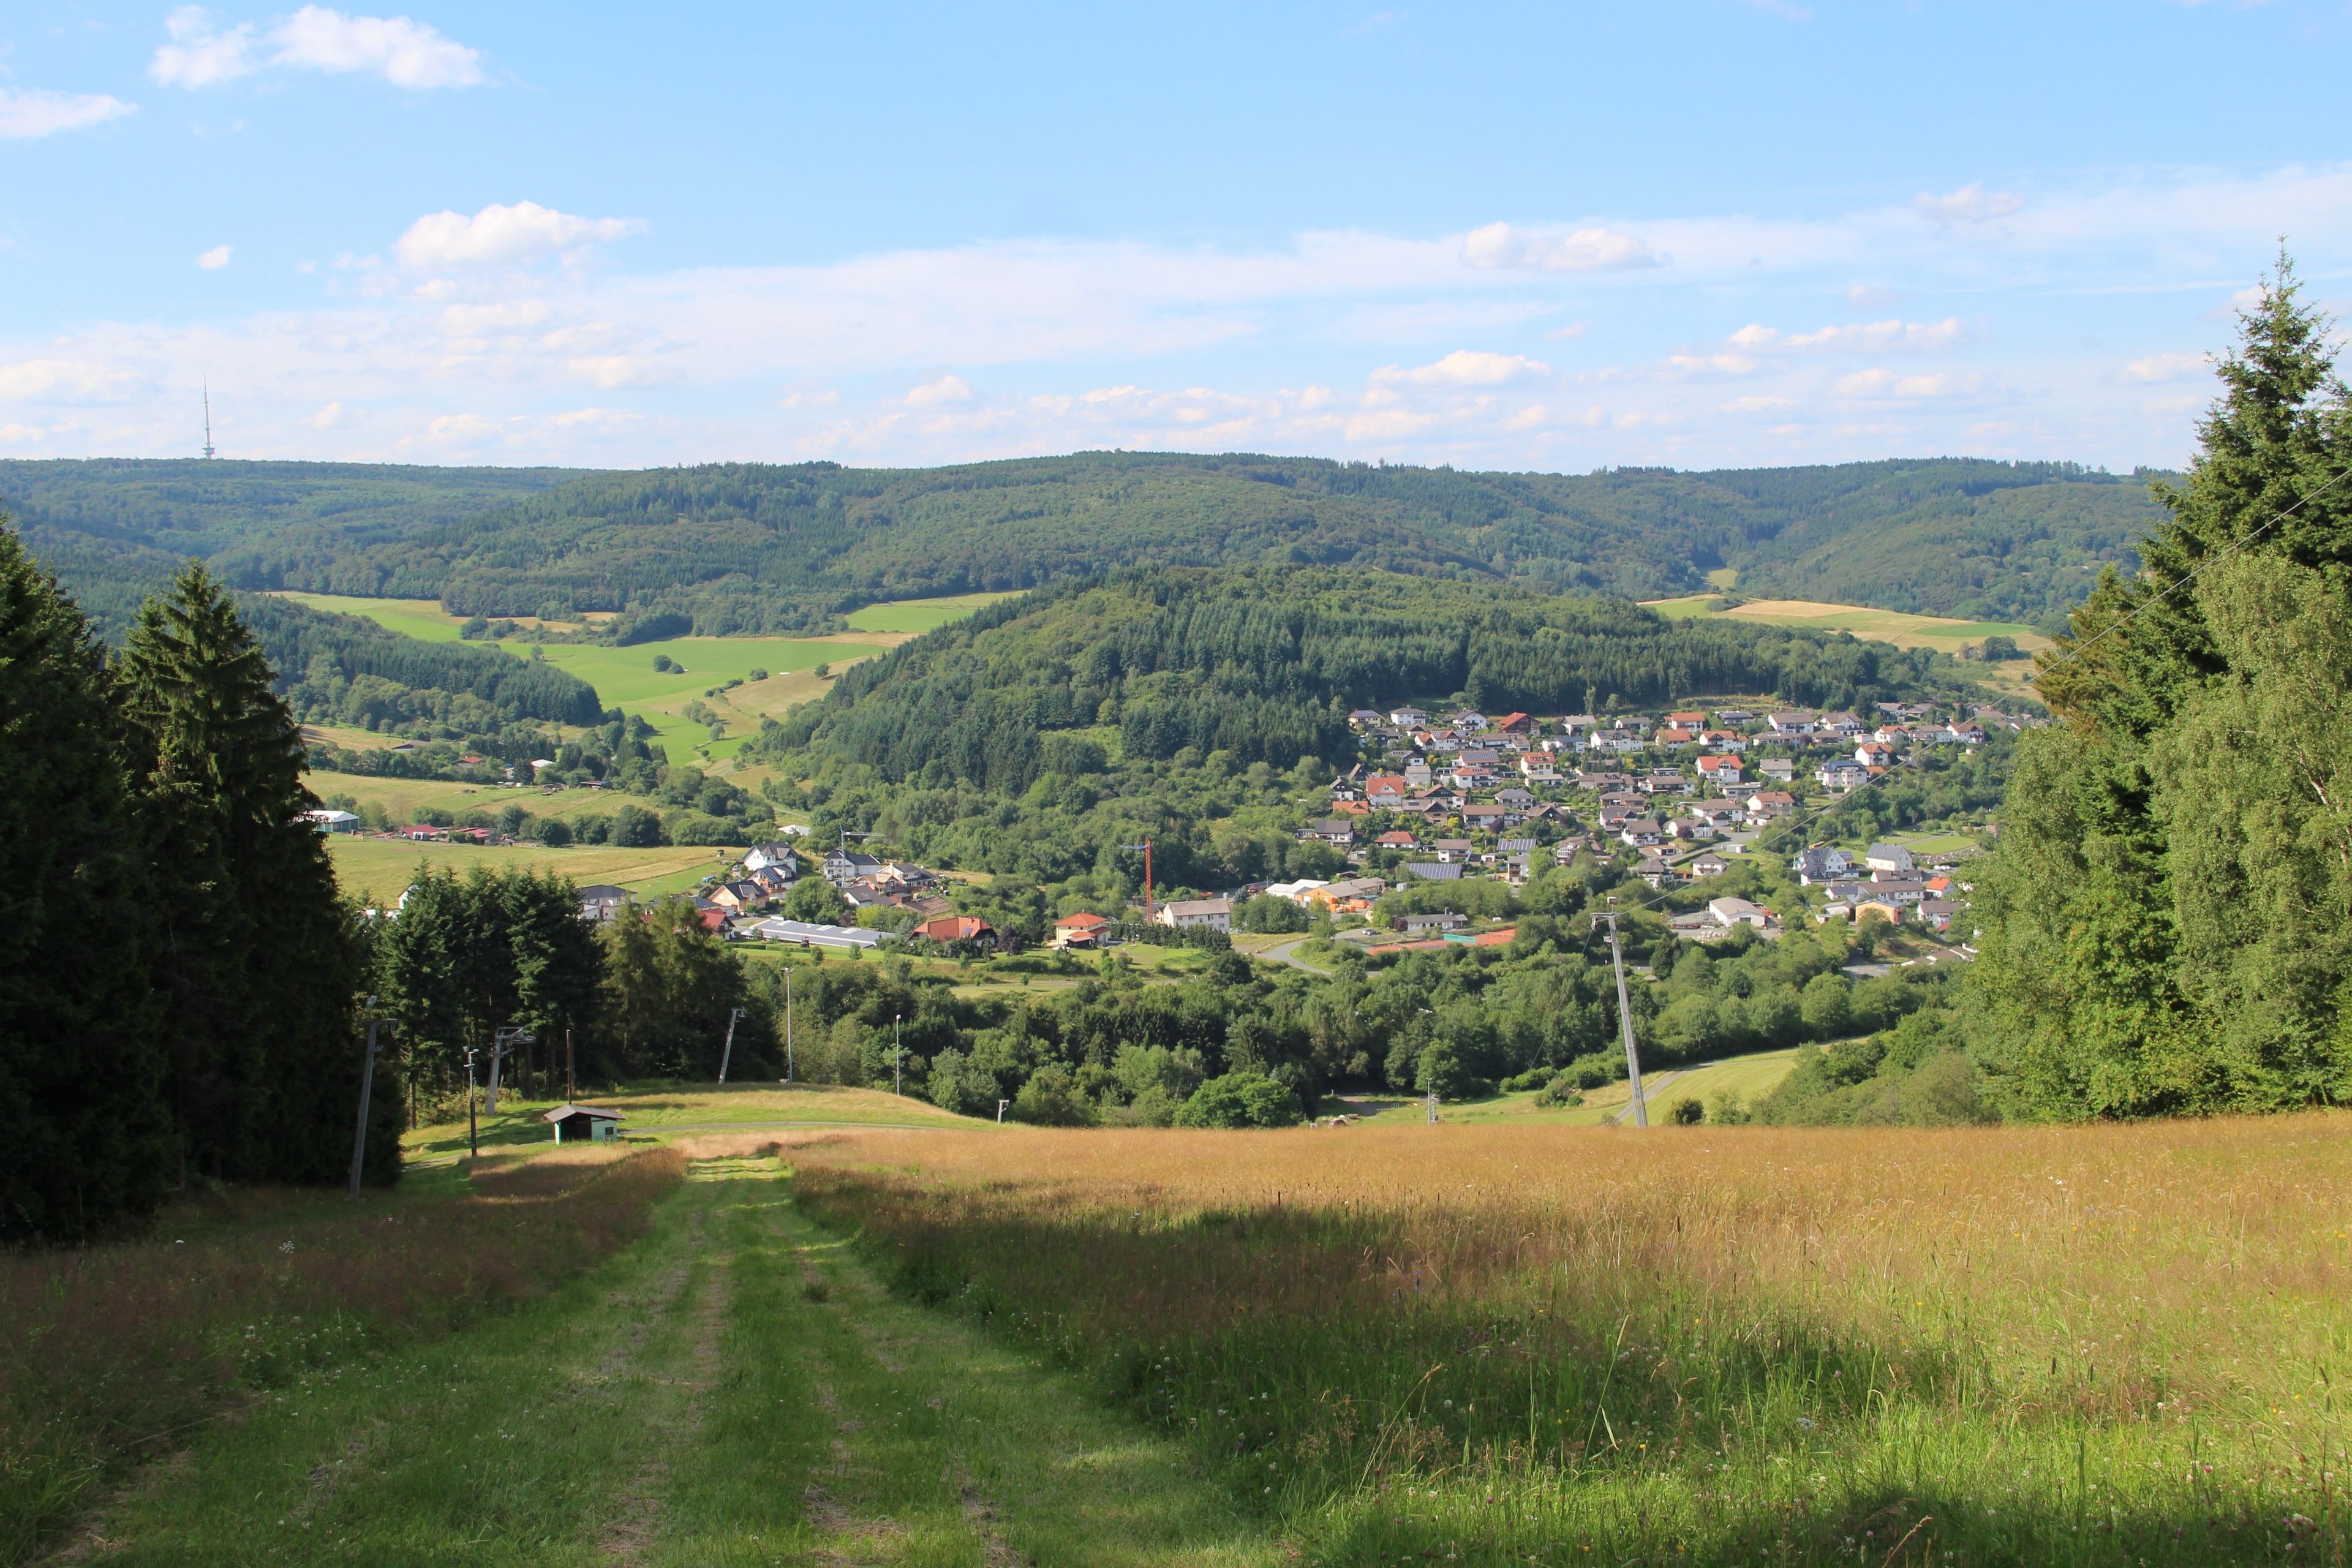 Bad Endbach, Hessen, Germany